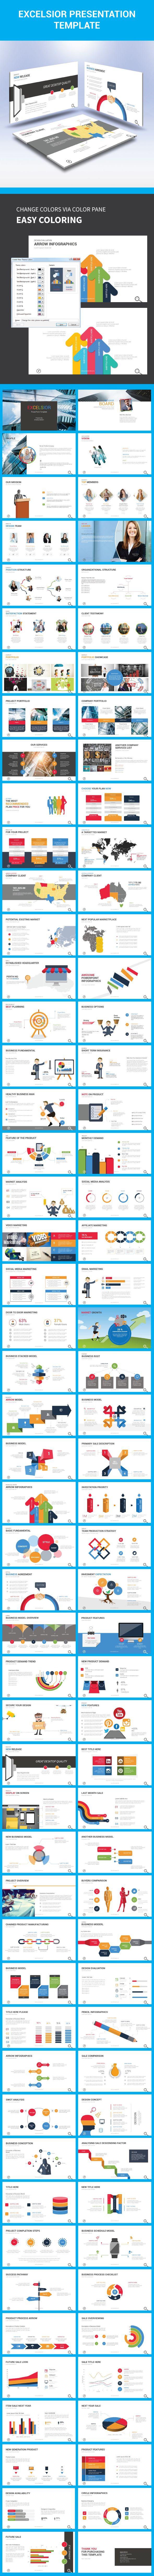 Excelsior PowerPoint Presentation Template #design #slides Download: http://graphicriver.net/item/excelsior-presentation-template/14341939?ref=ksioks